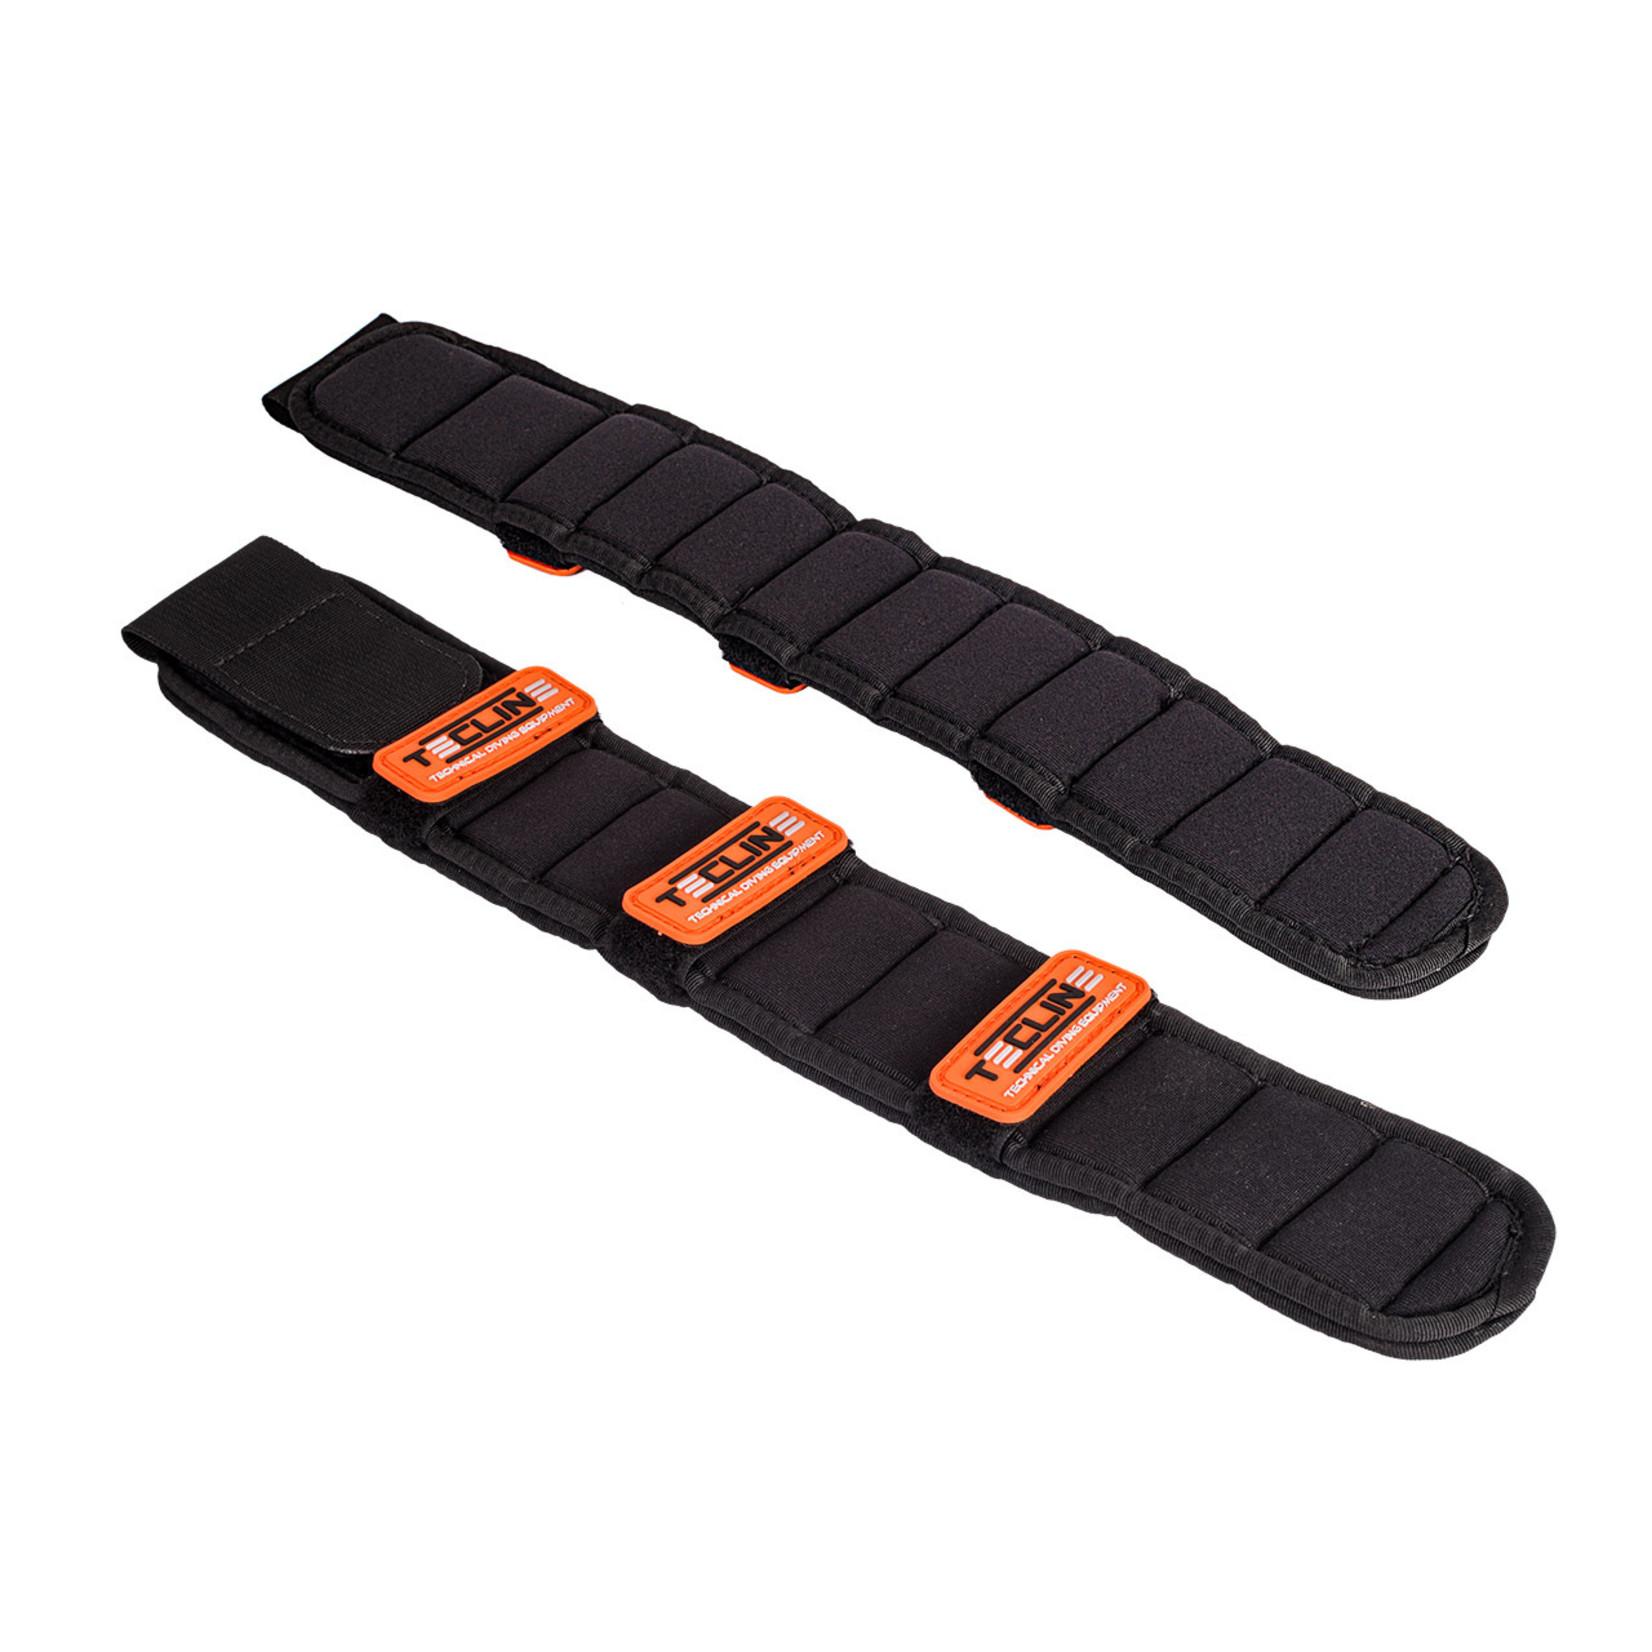 Tecline Shoulder pad with orange Tecline logo